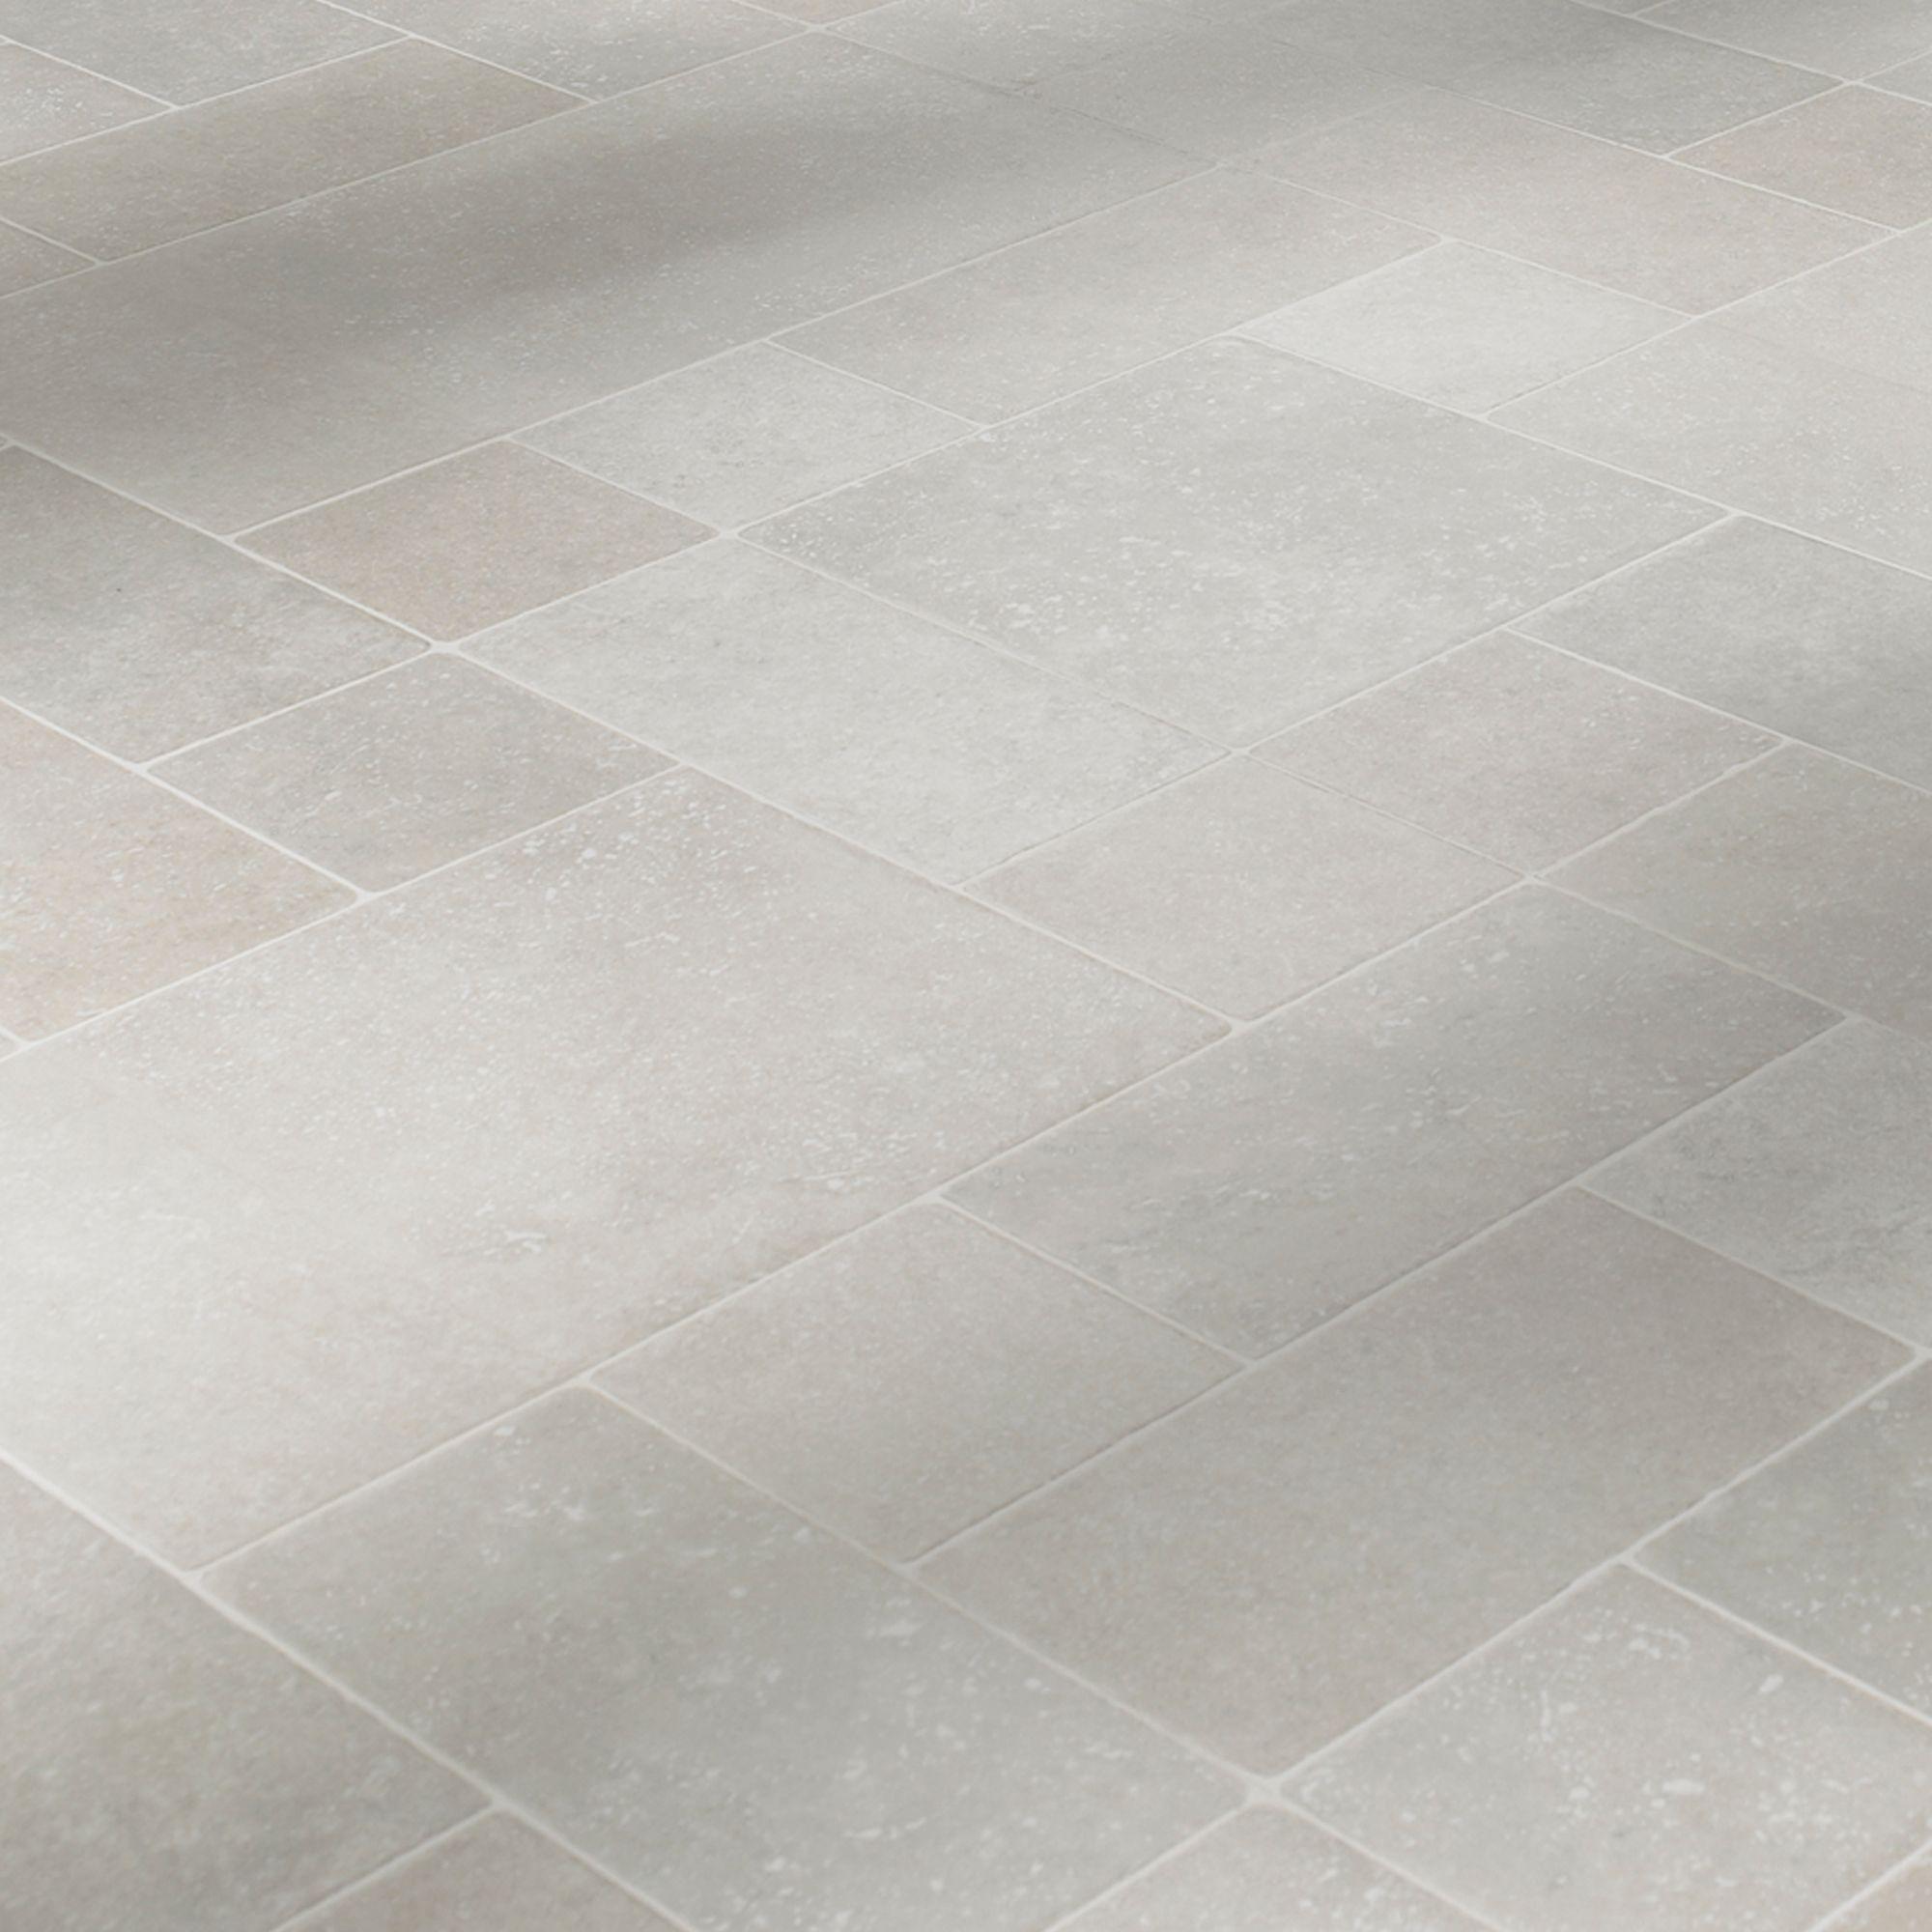 Barbarita Limestone Effect Laminate Flooring 9.9 m² Pack